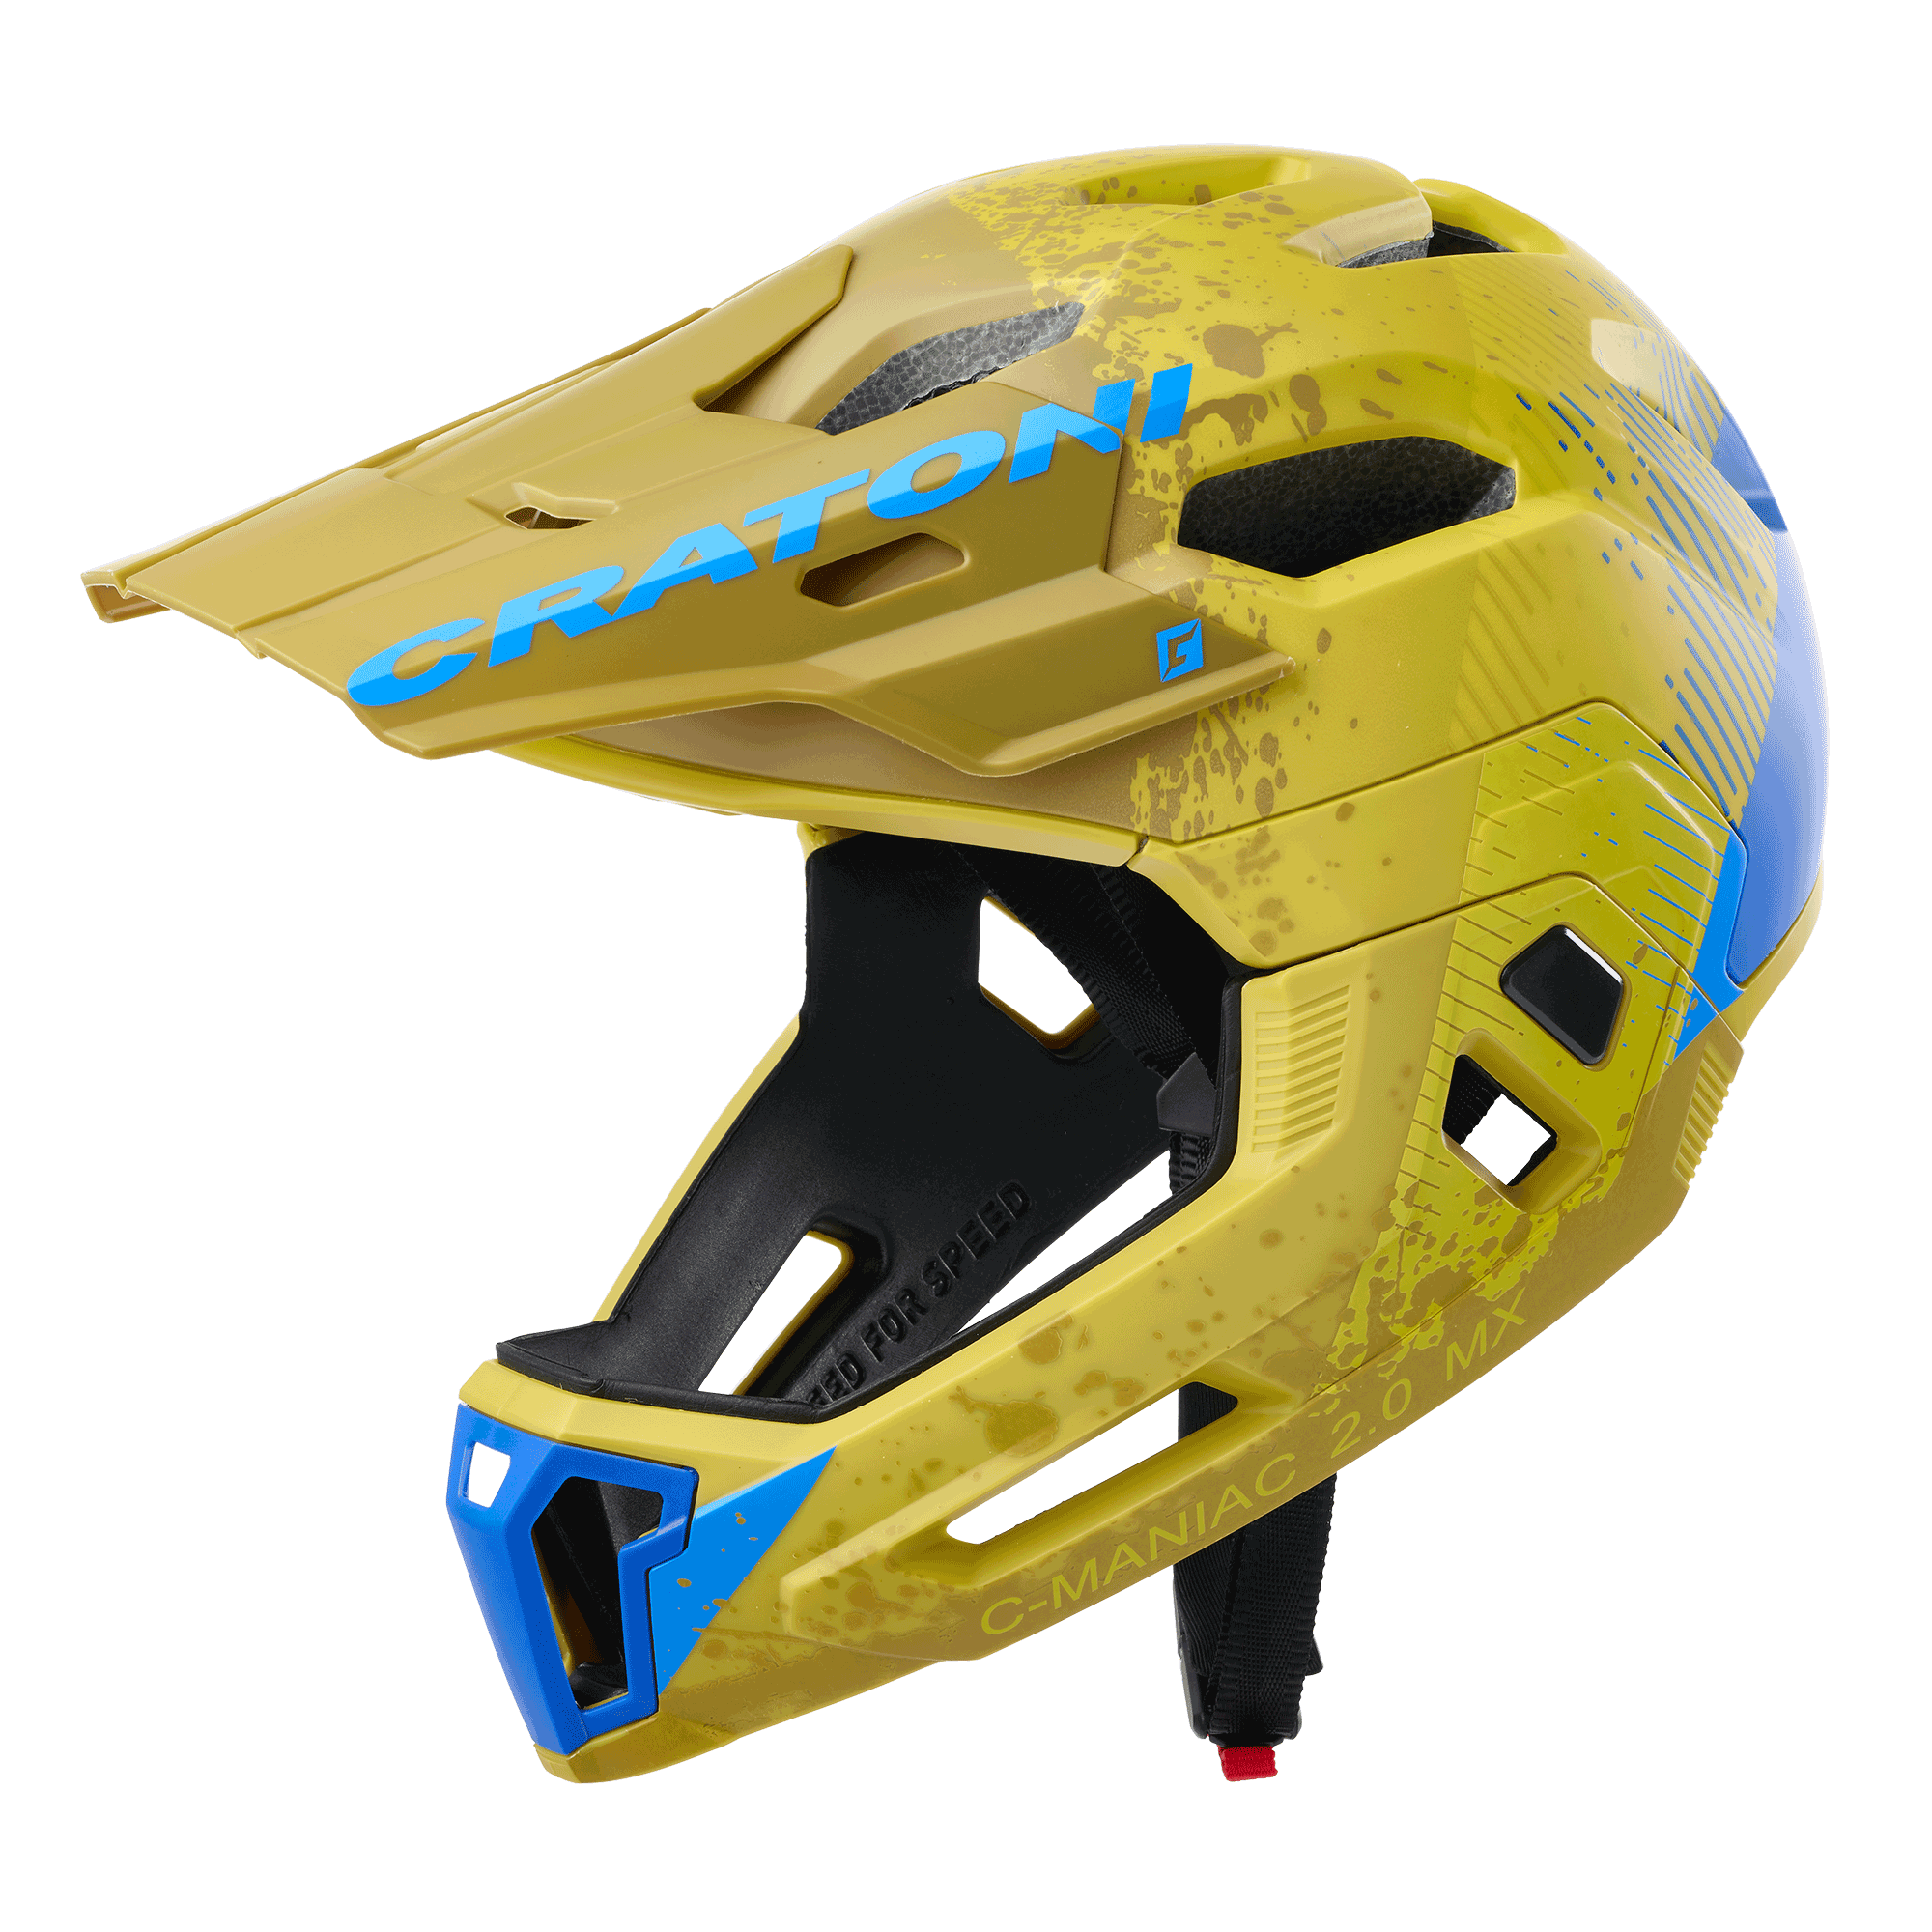 C-Maniac 2.0 MX yellow-blue matt